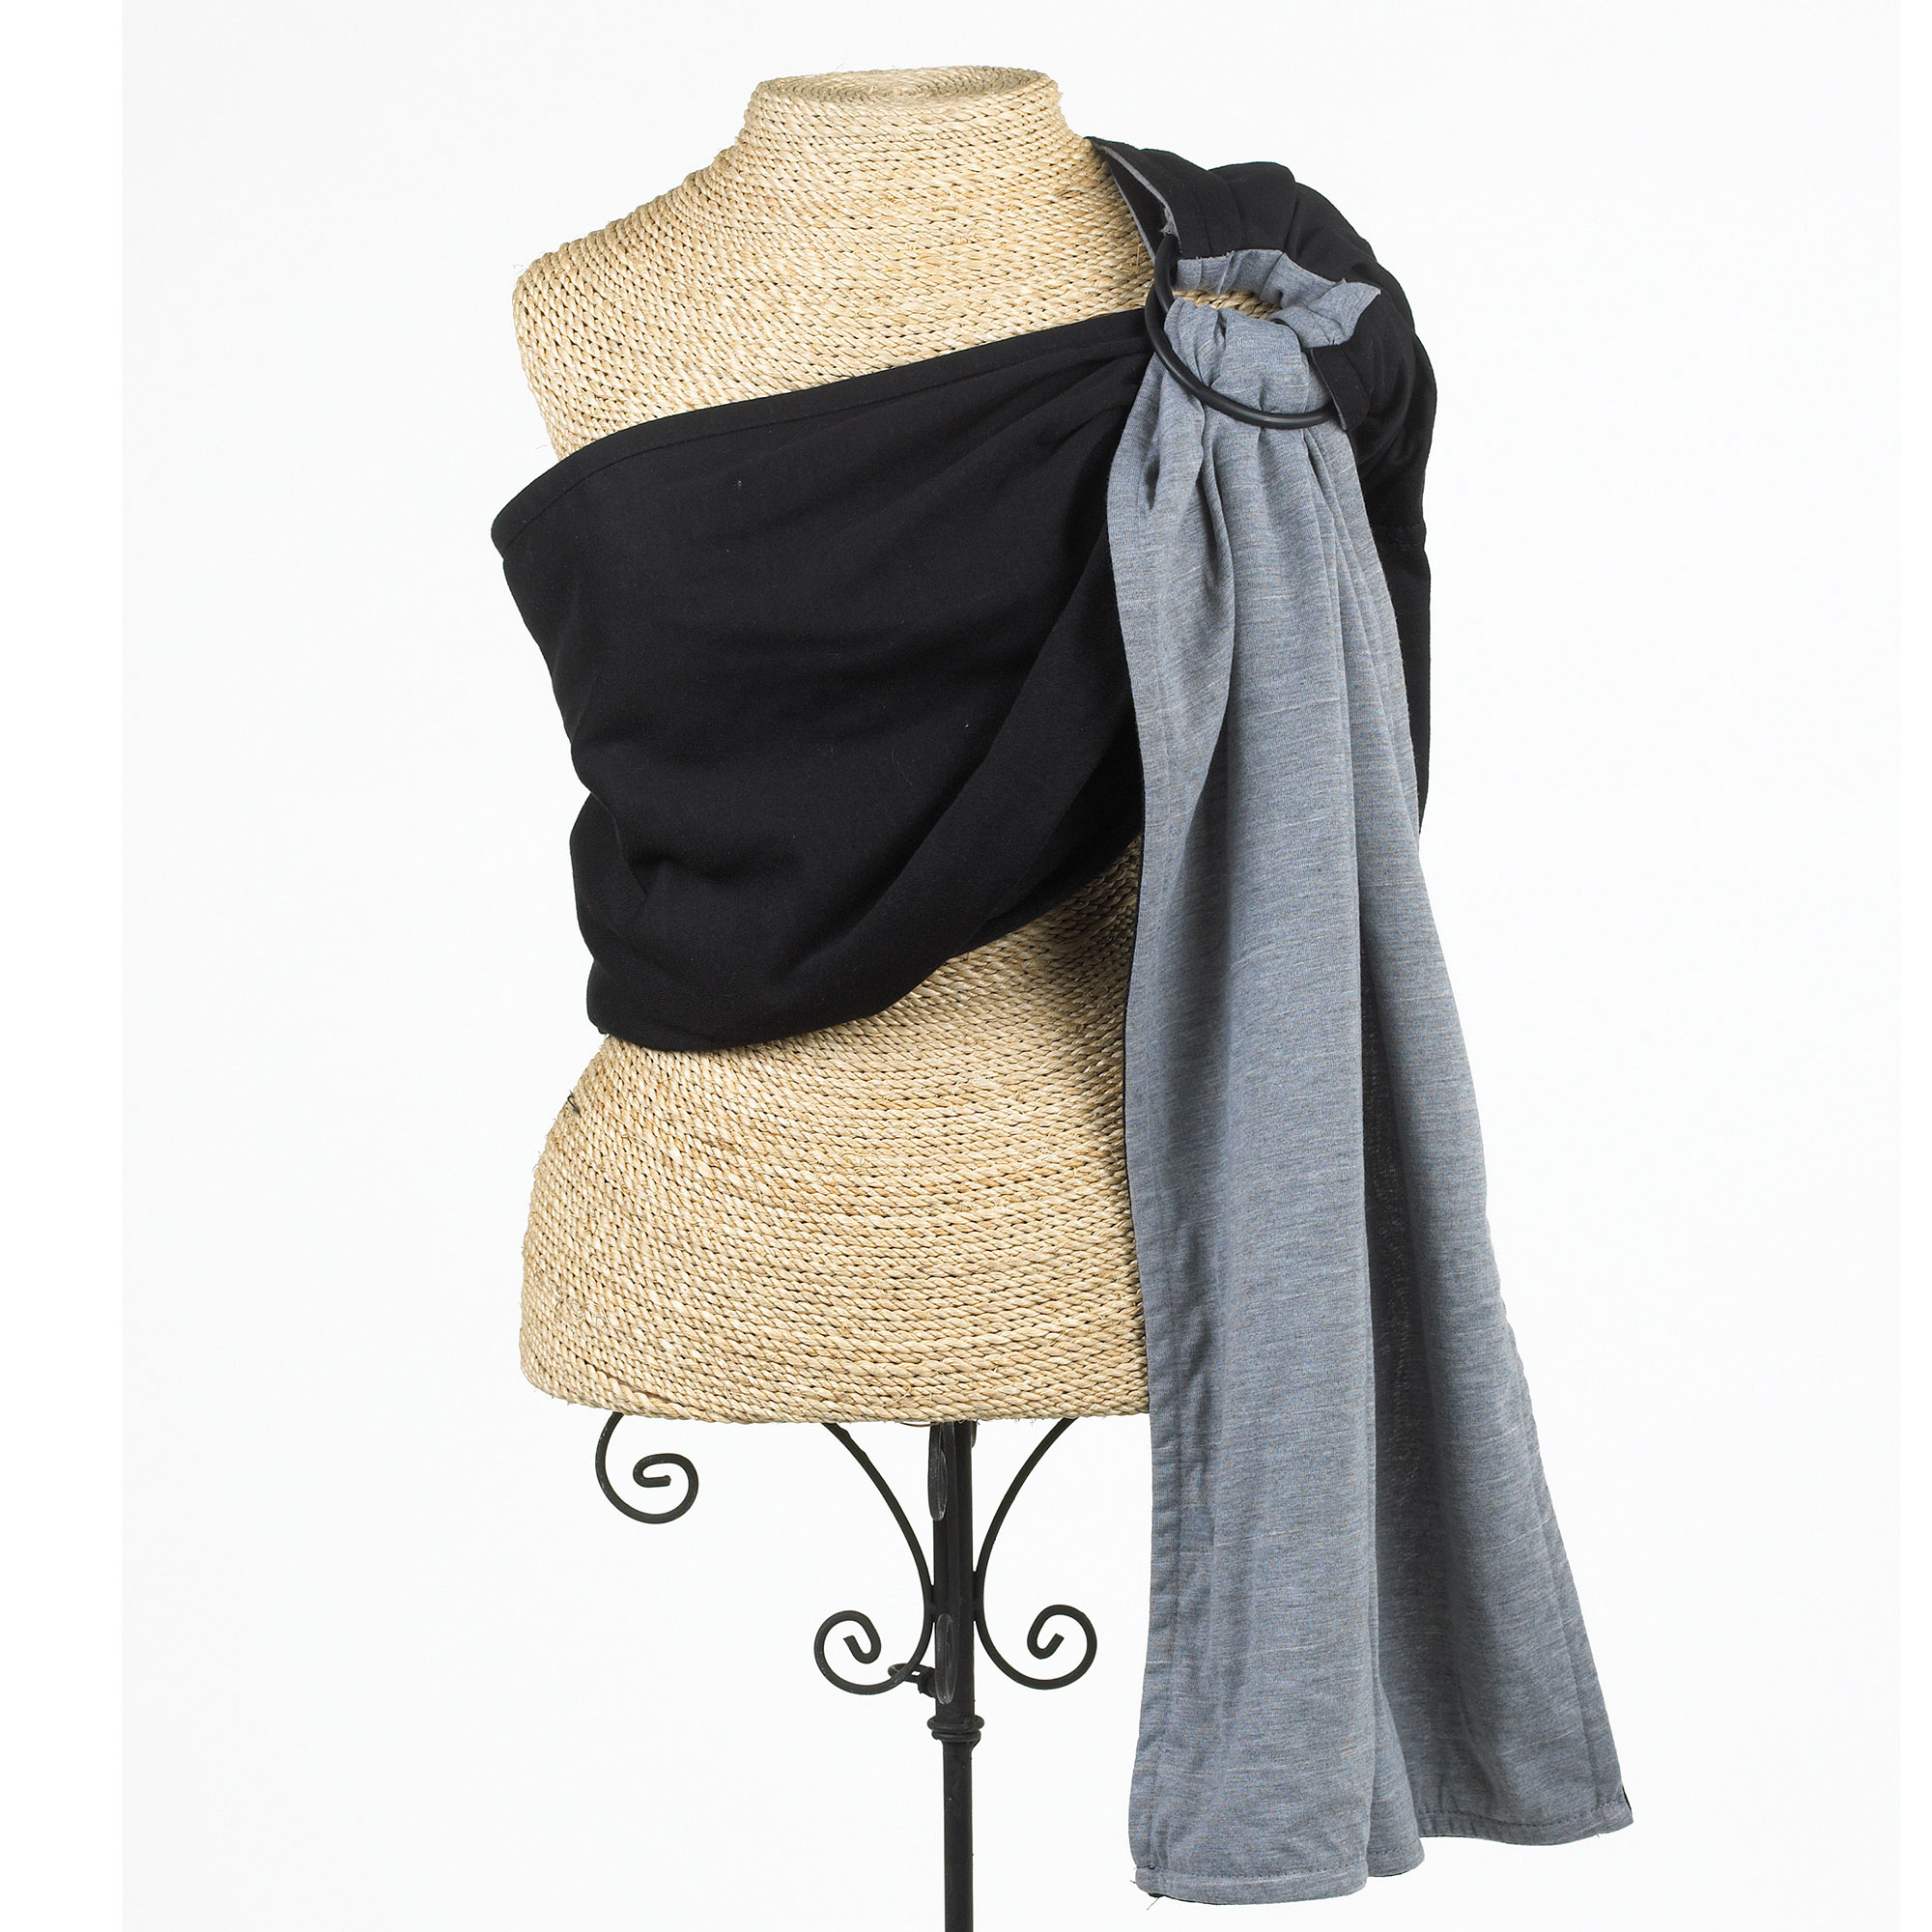 Balboa Baby Sling - Reversible Jersey Ring Sling - Black and Grey